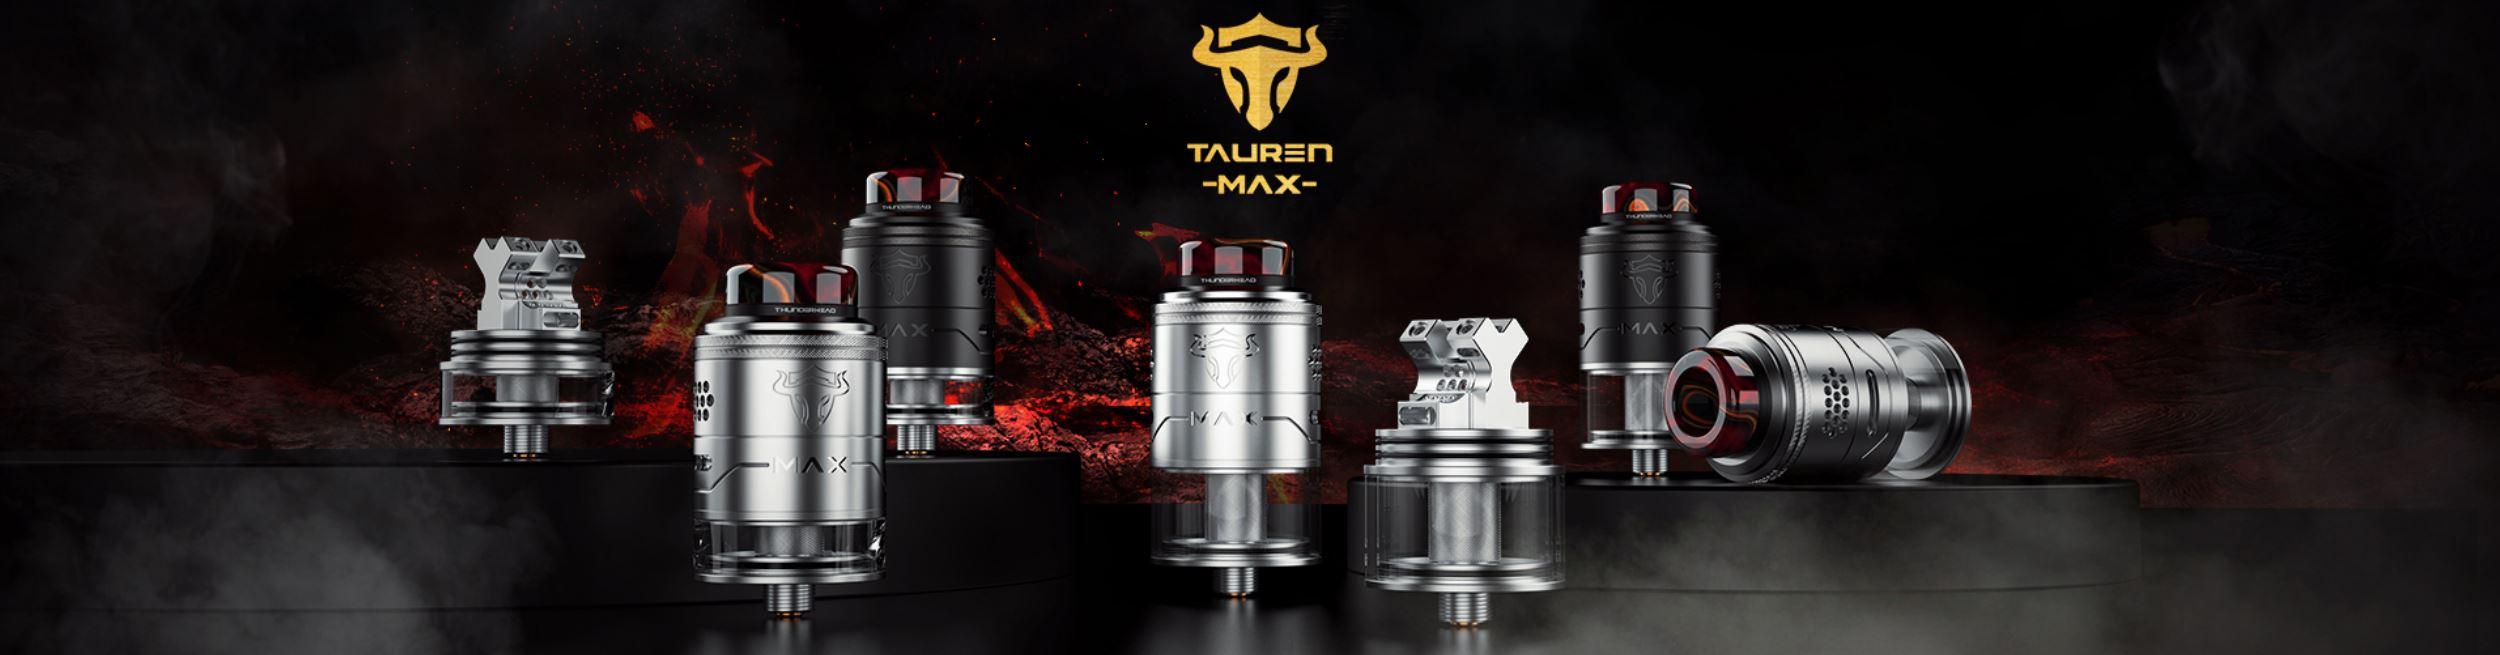 THC Tauren Max RDTA